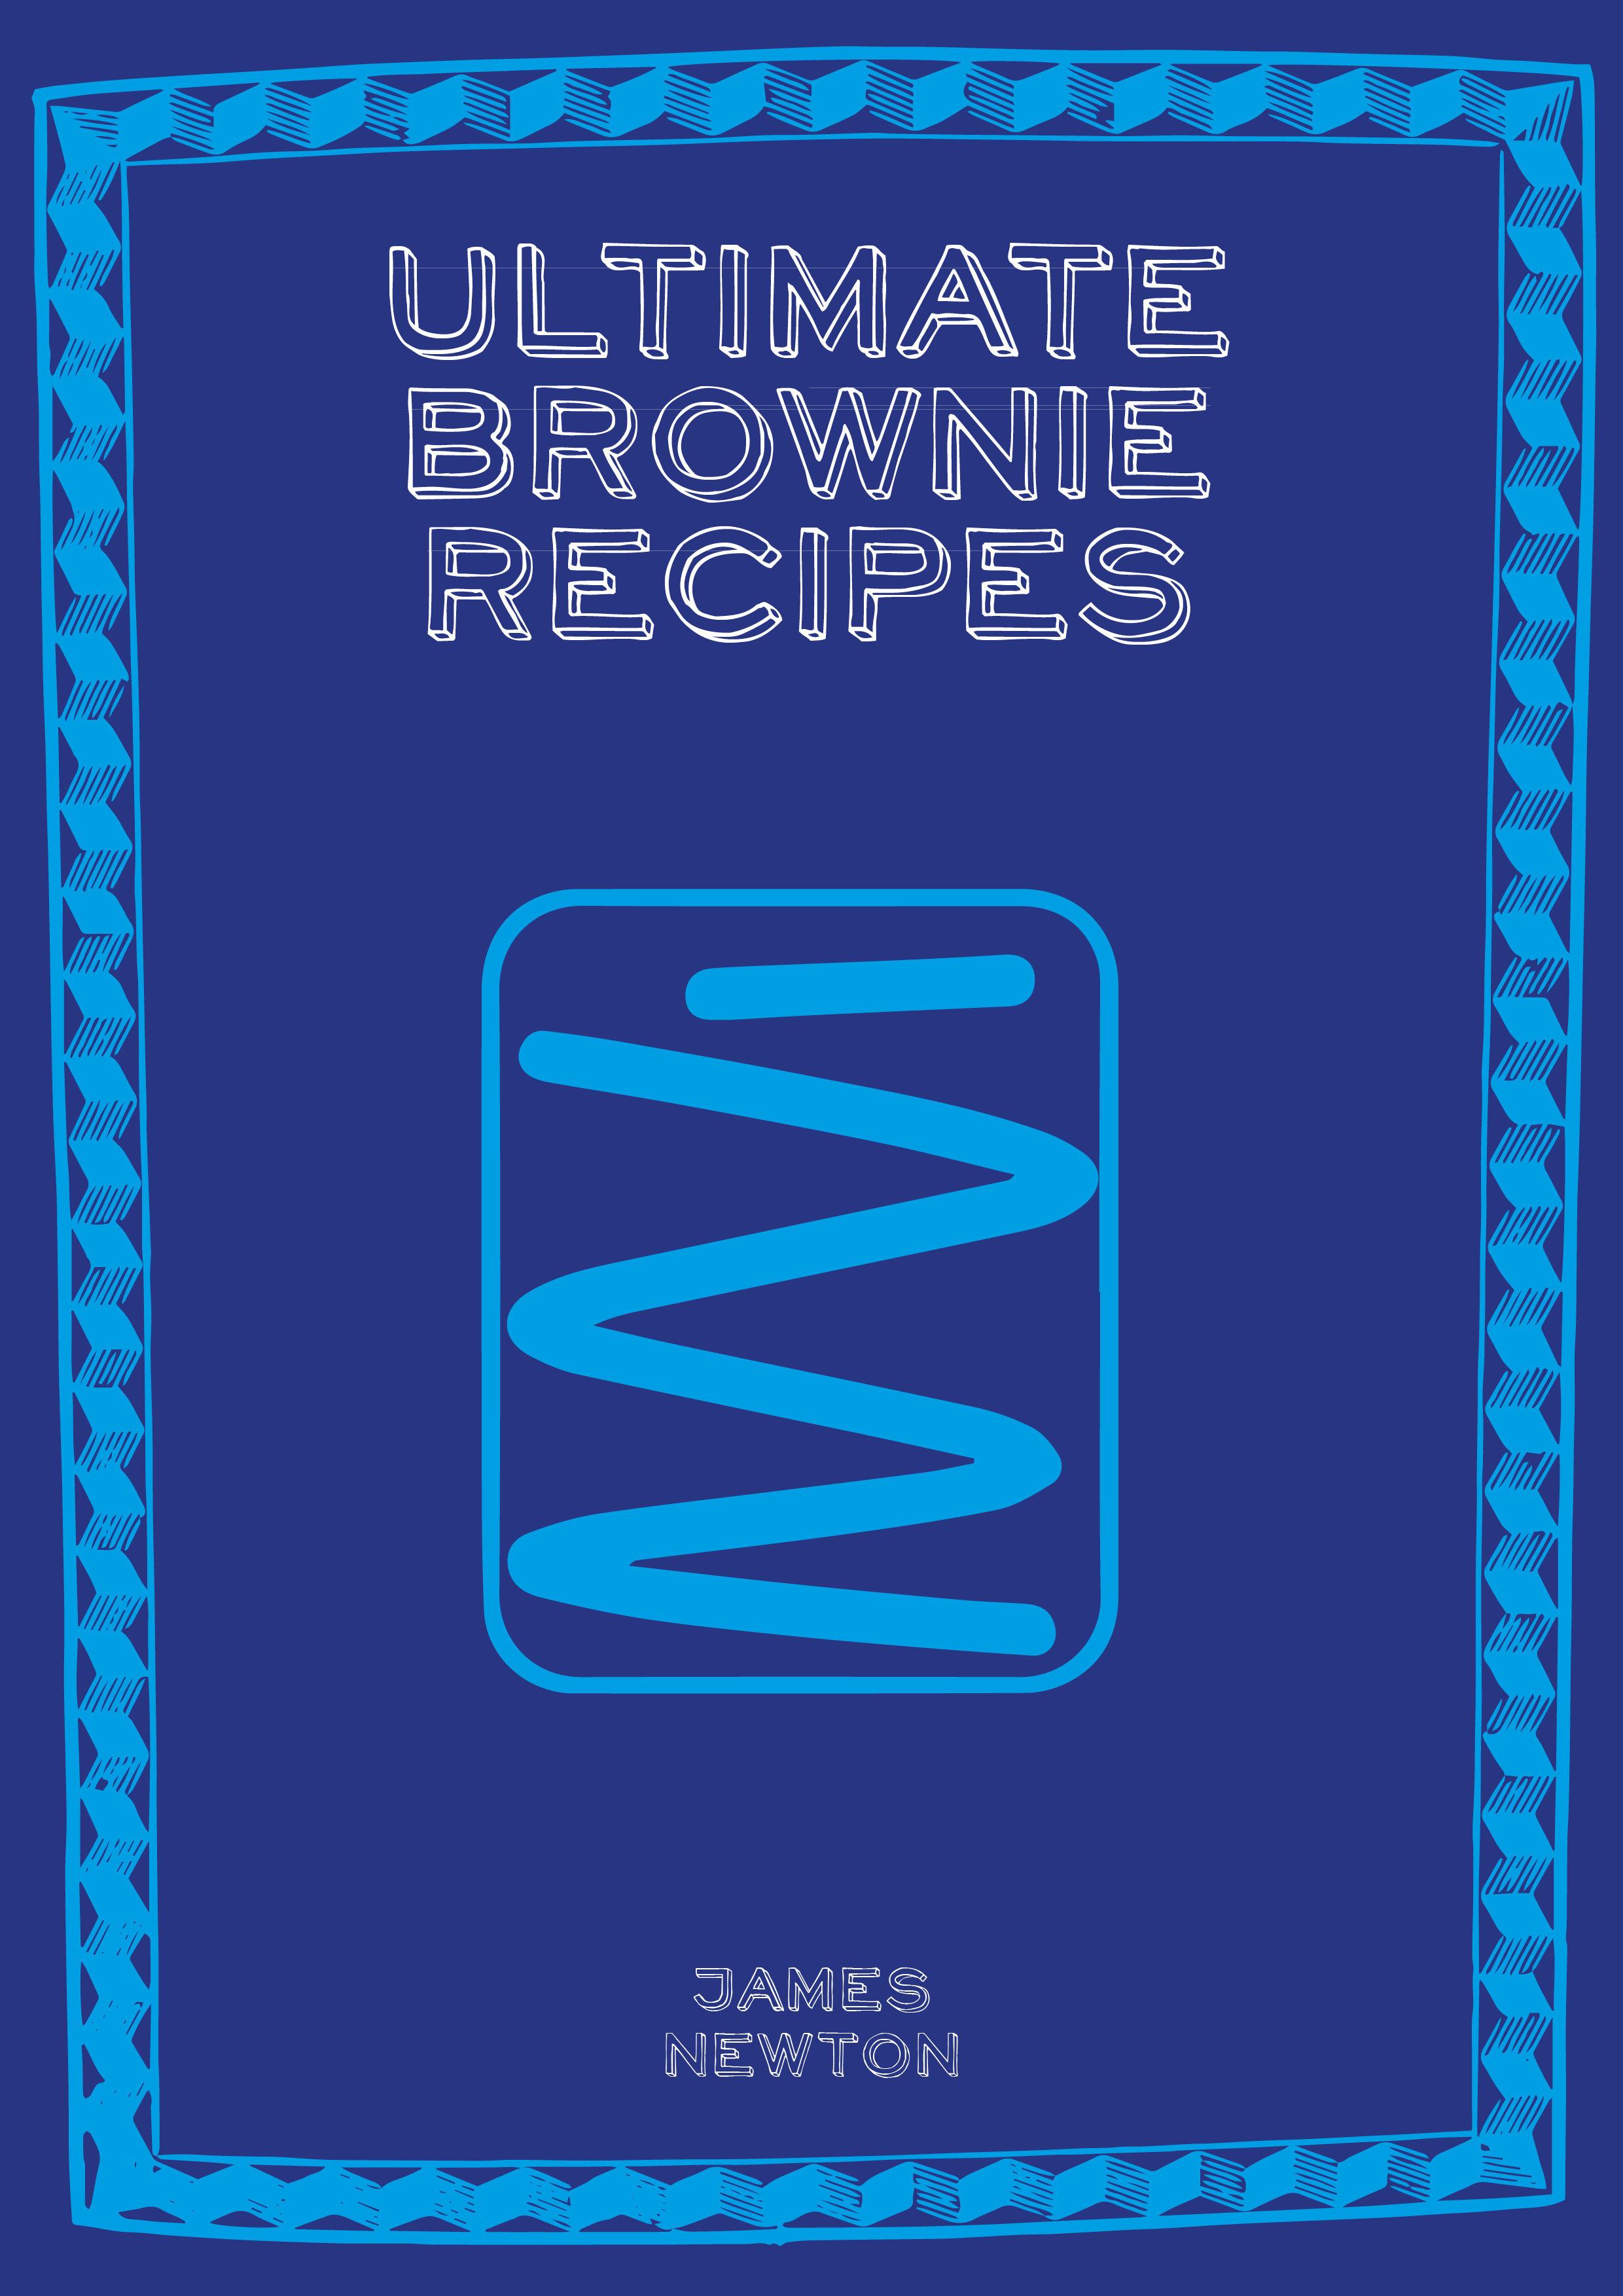 Ultimate Brownie Recipes James Newton